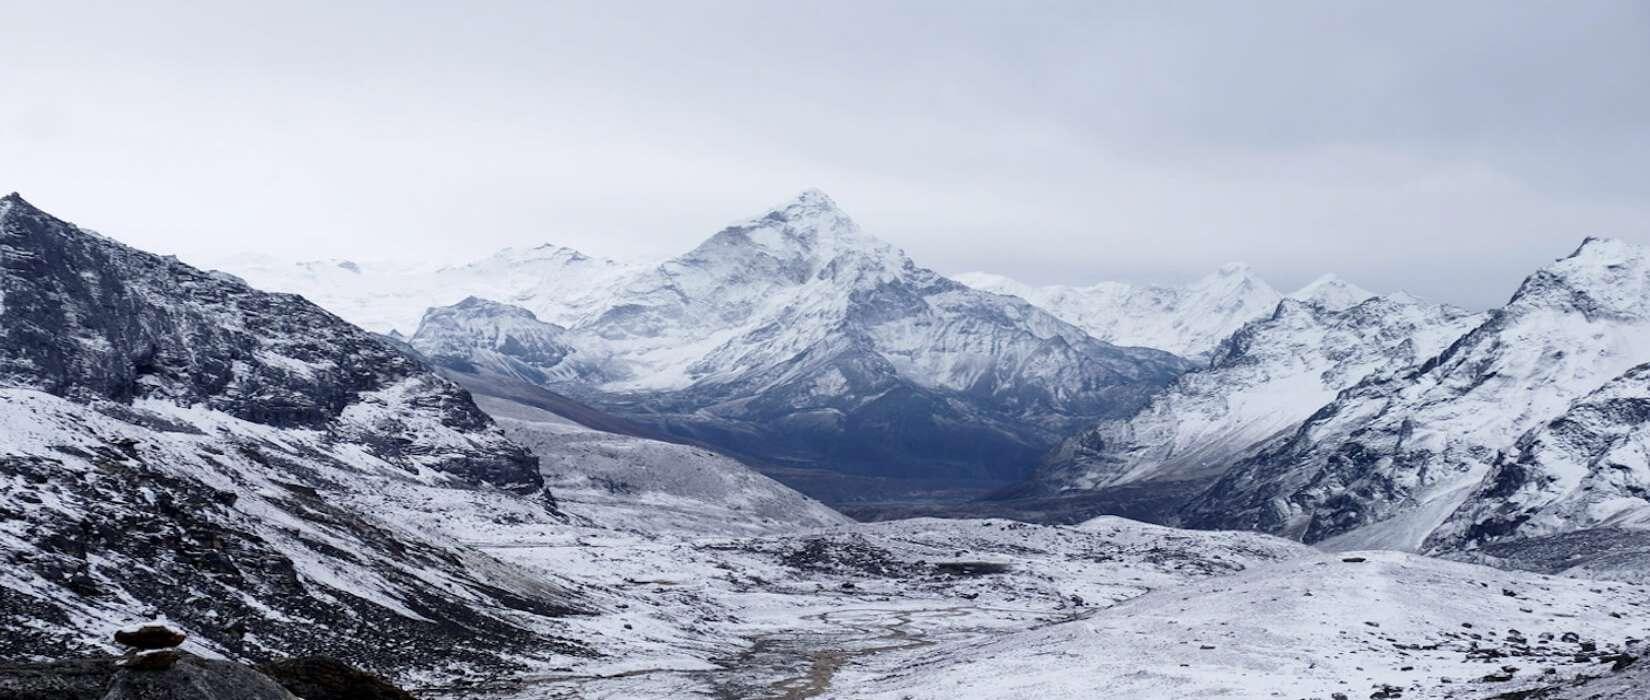 Mount Everest Trek